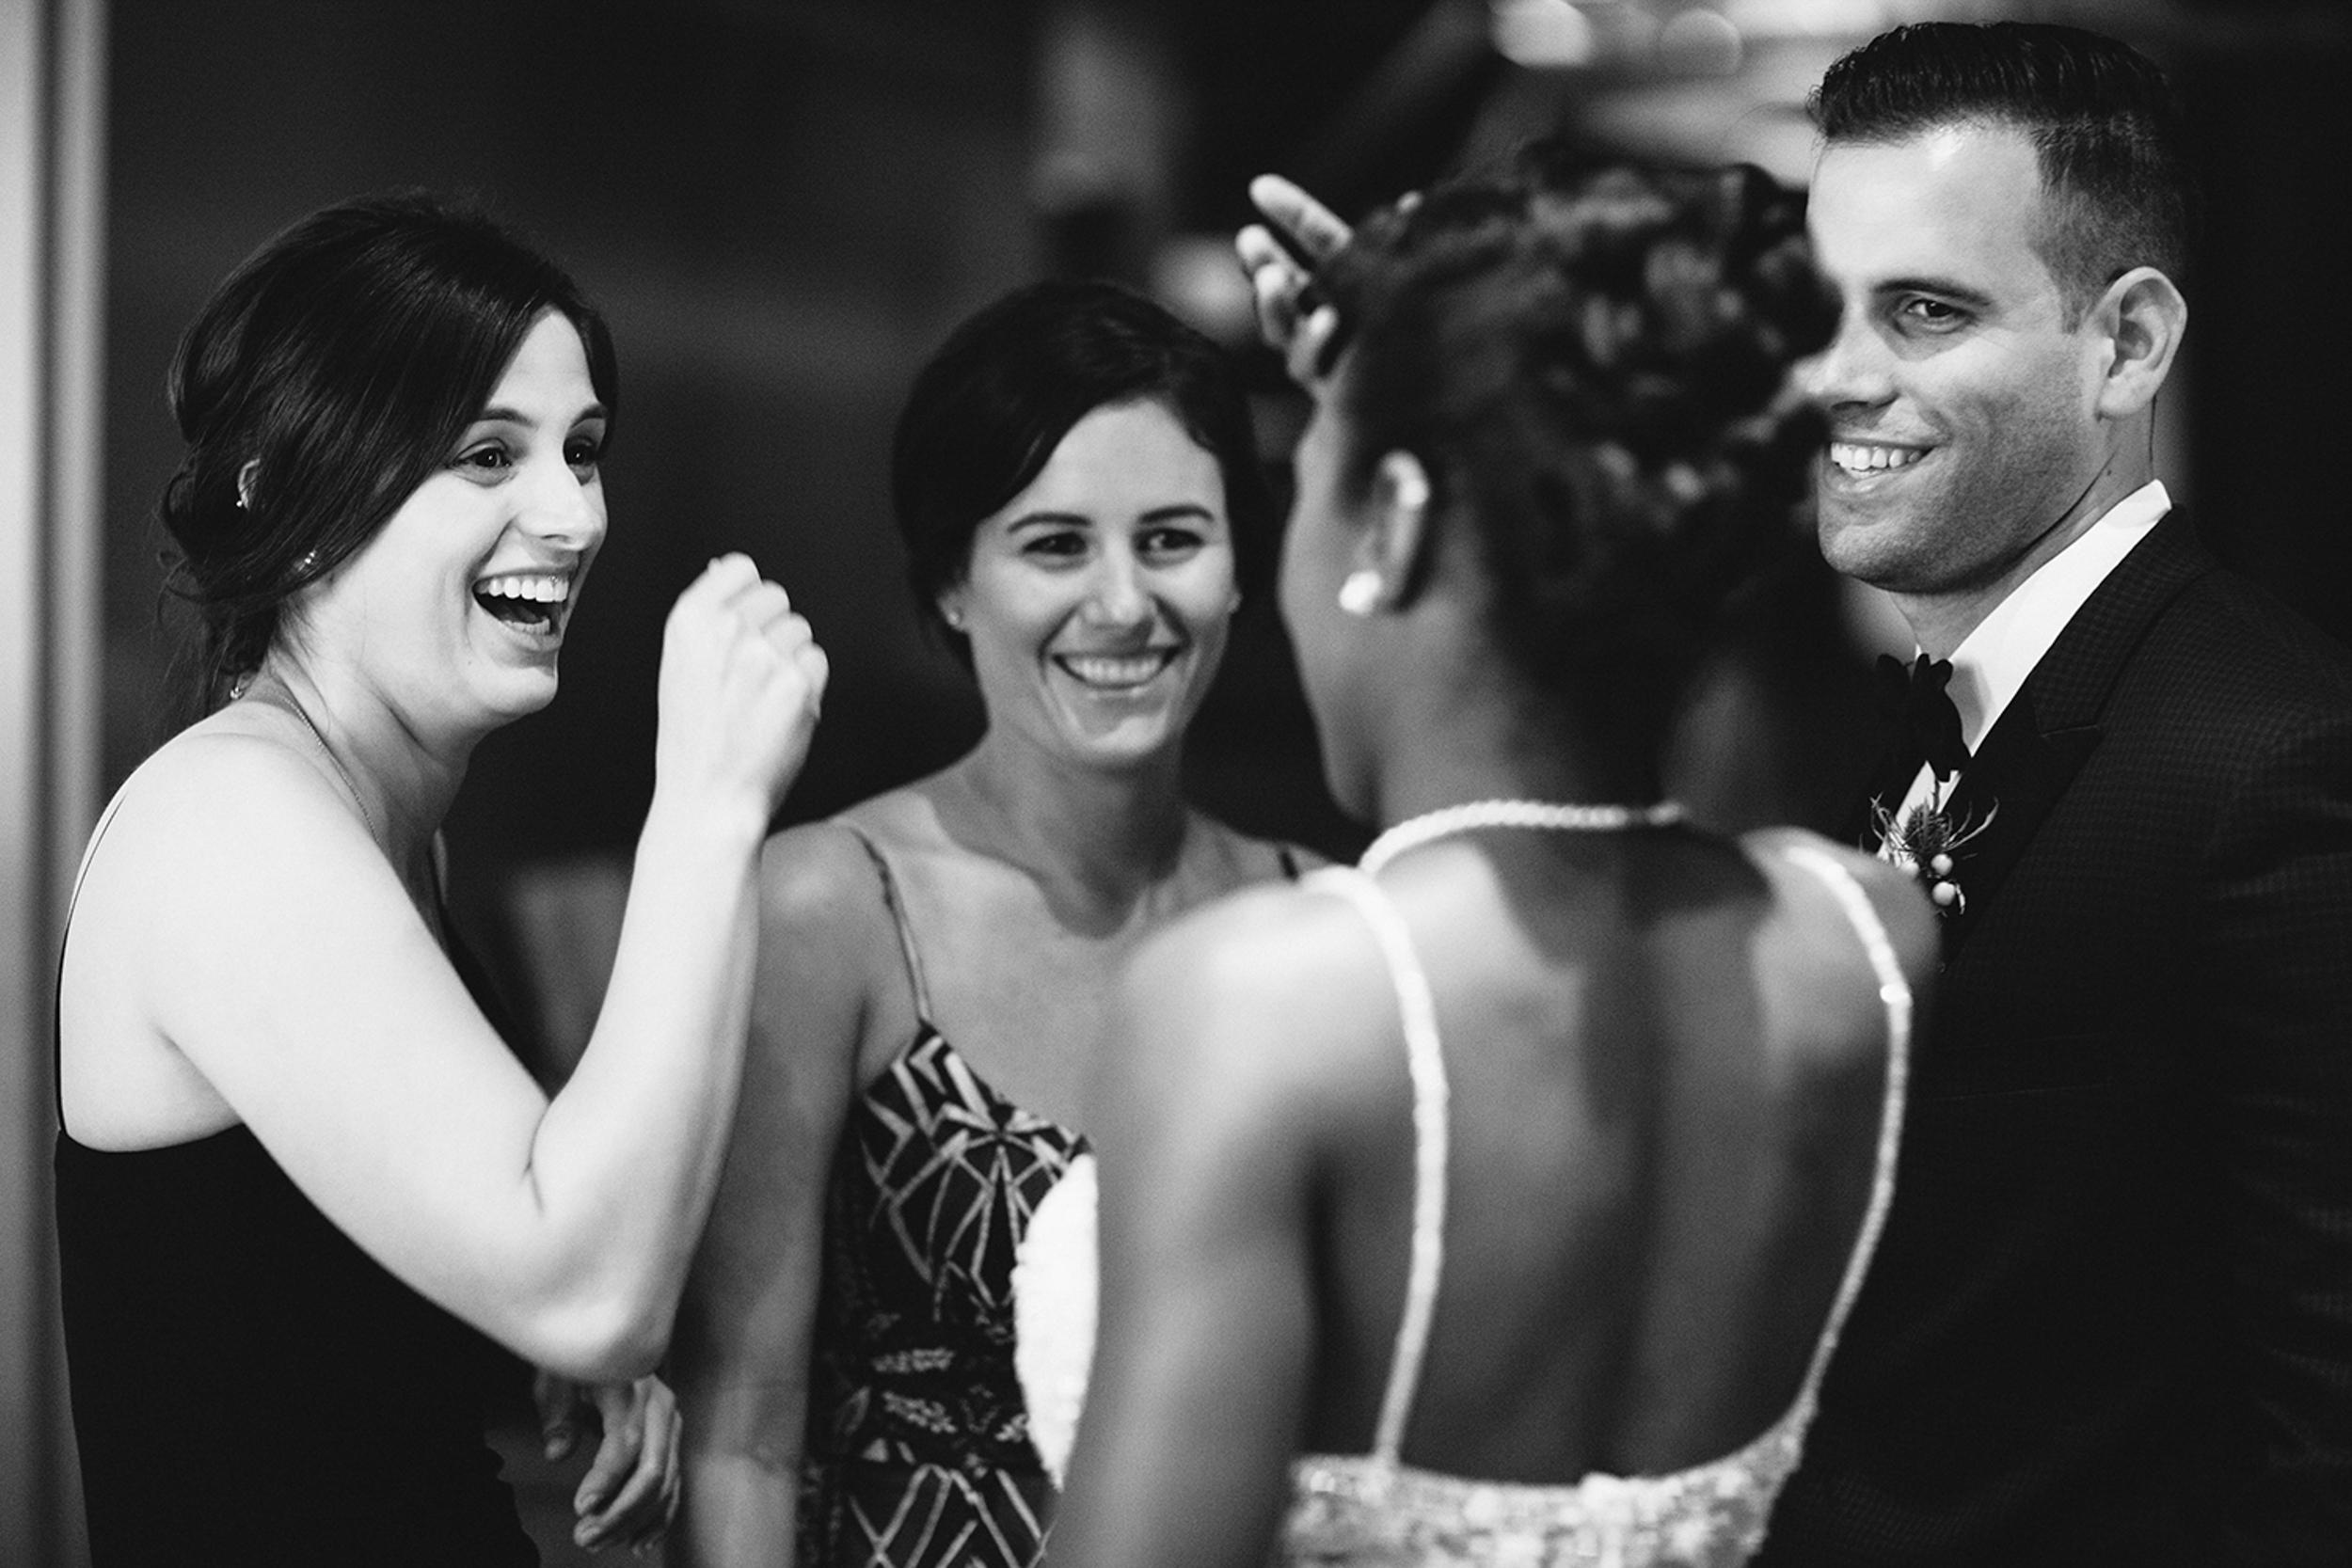 chicago.wedding.urban.intimate.zed451.lake.milton olive park-77.jpg